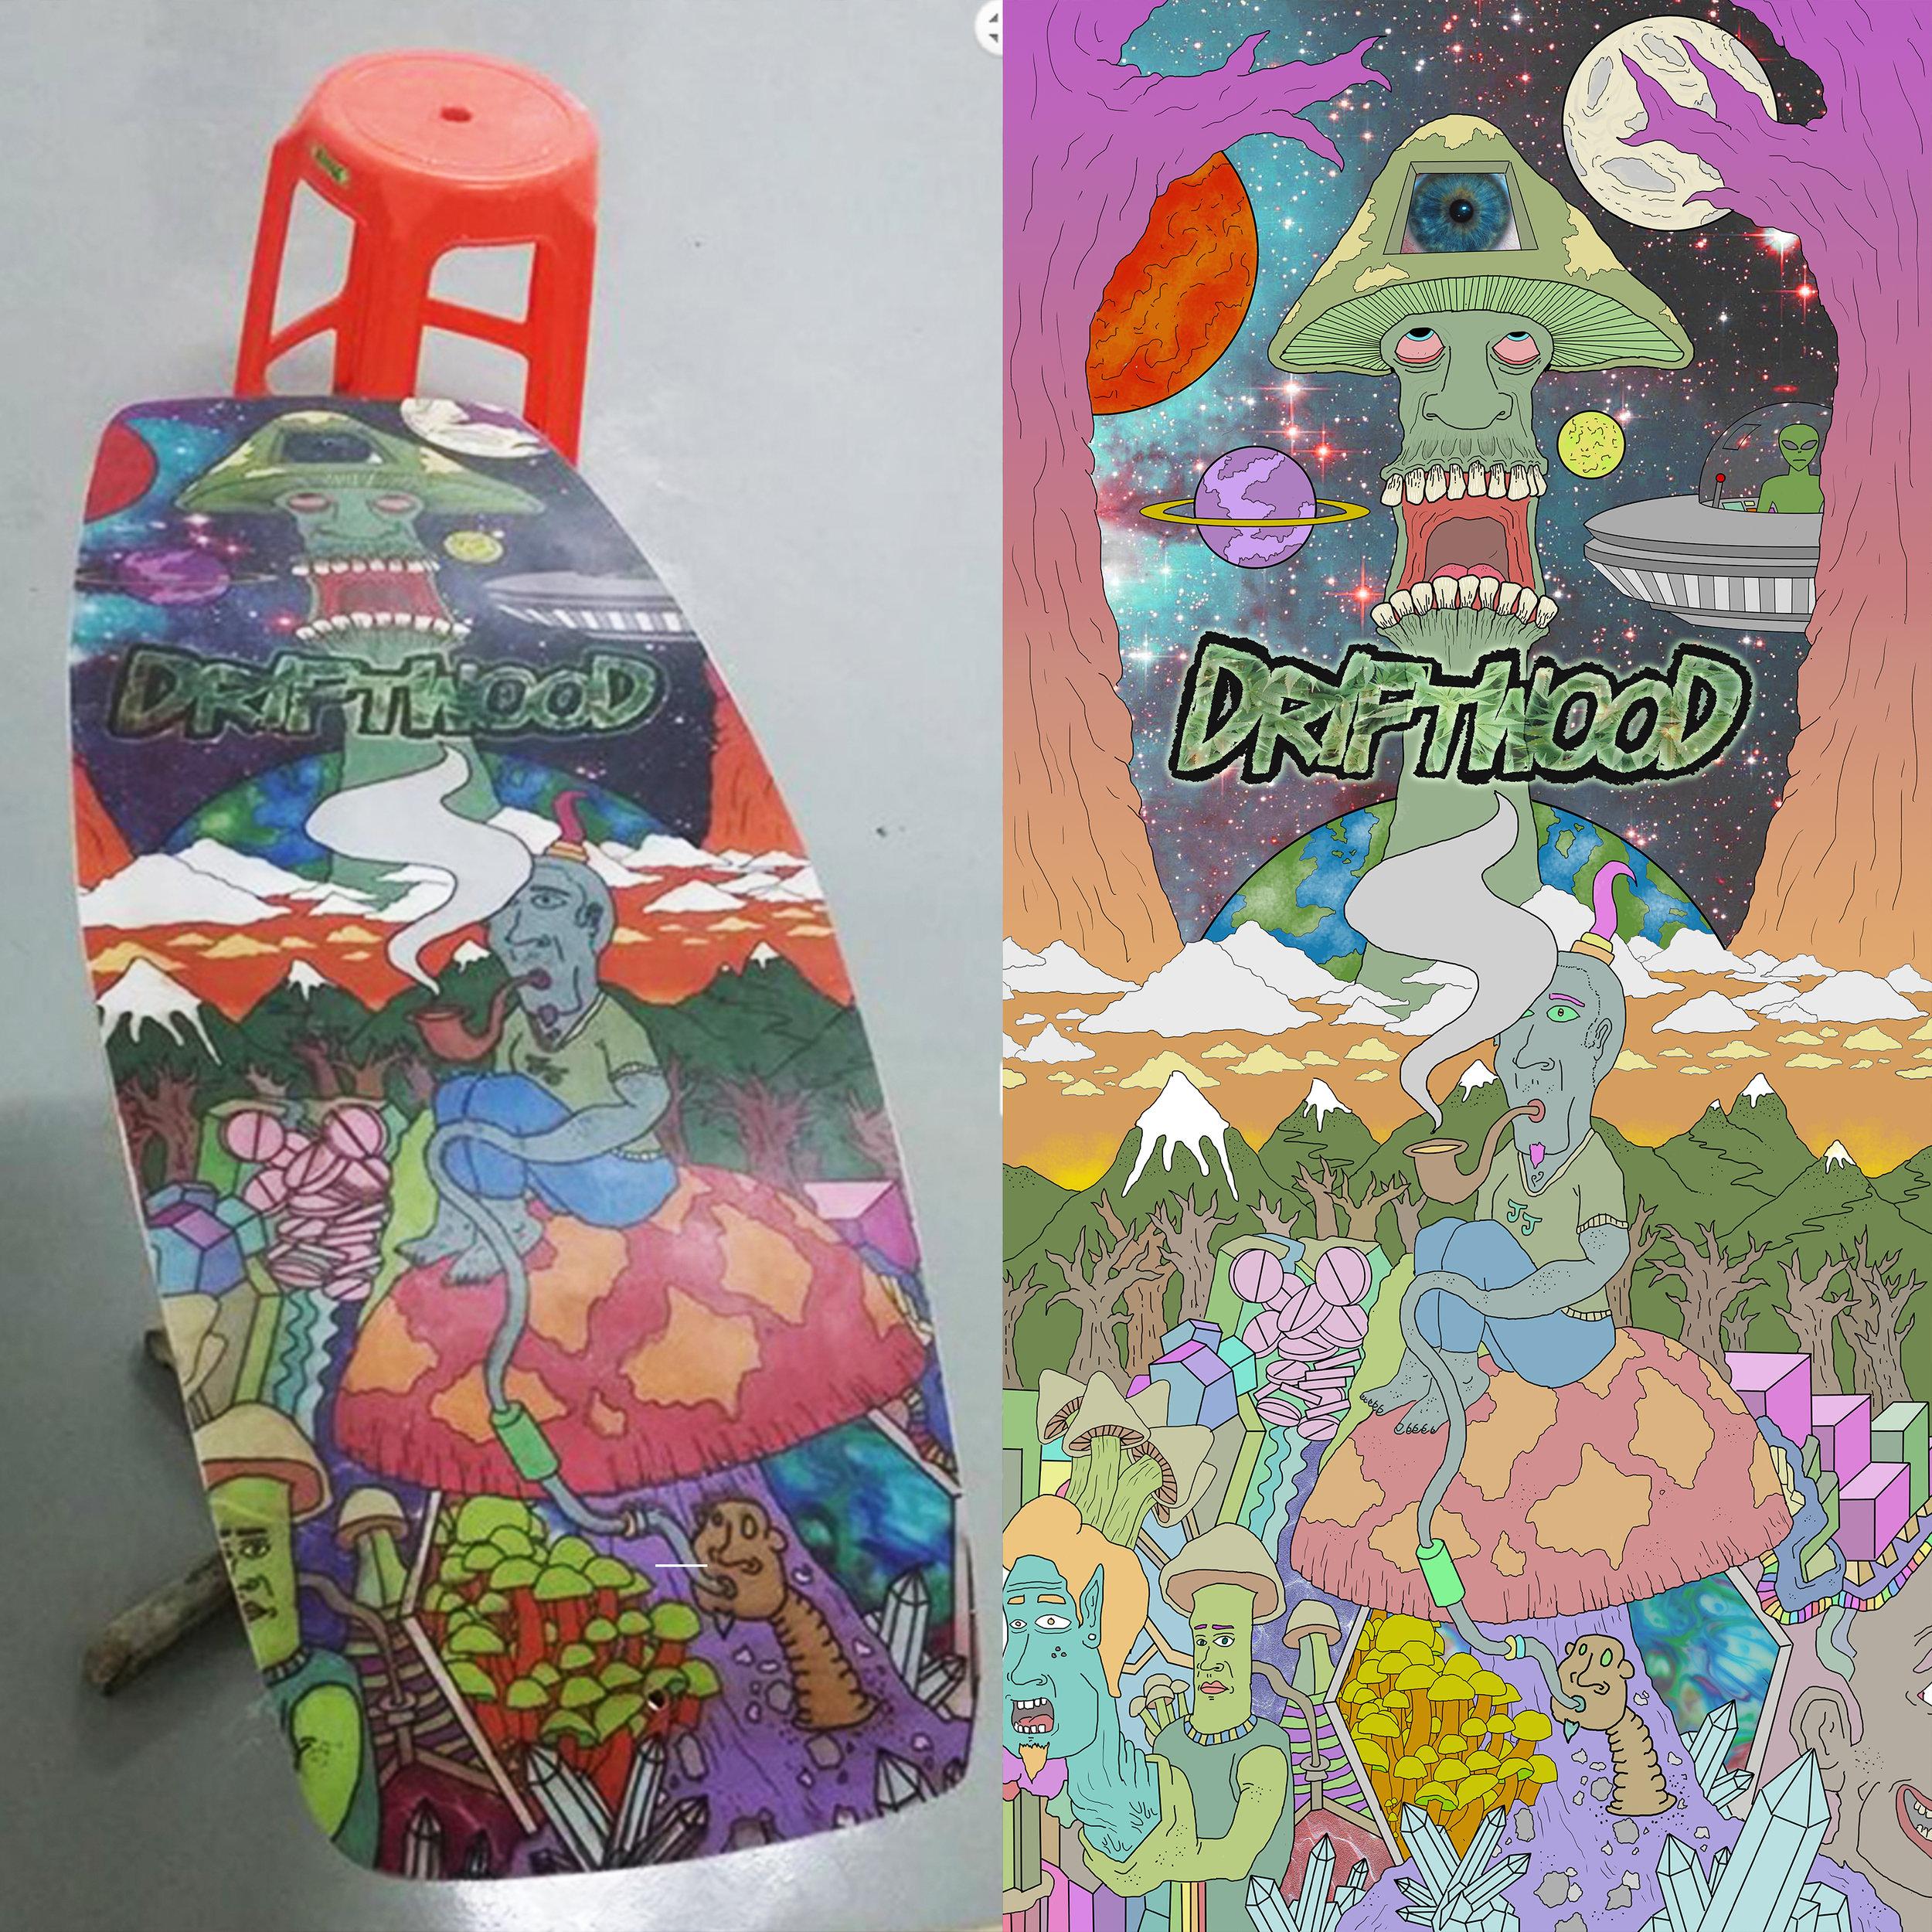 'Driftwood' artist series wakeskate design (2014)